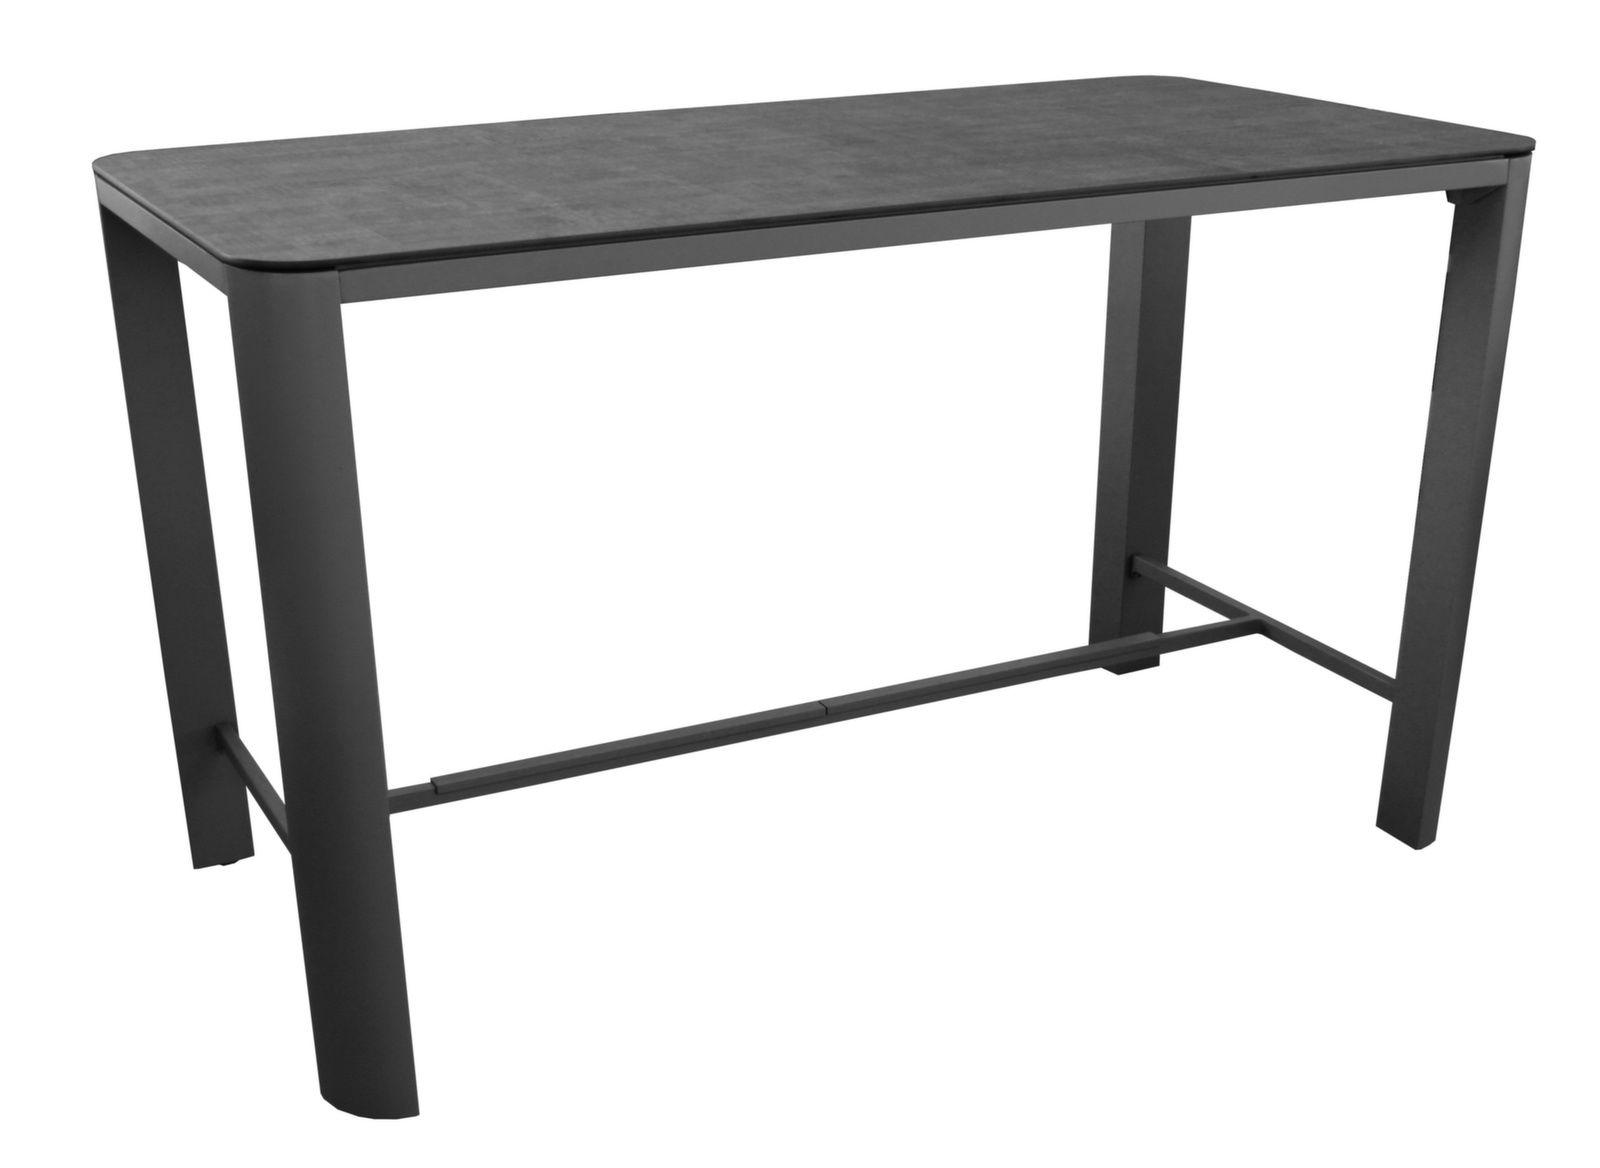 table eole haute 150x75 plateau trespa tables hautes de jardin. Black Bedroom Furniture Sets. Home Design Ideas